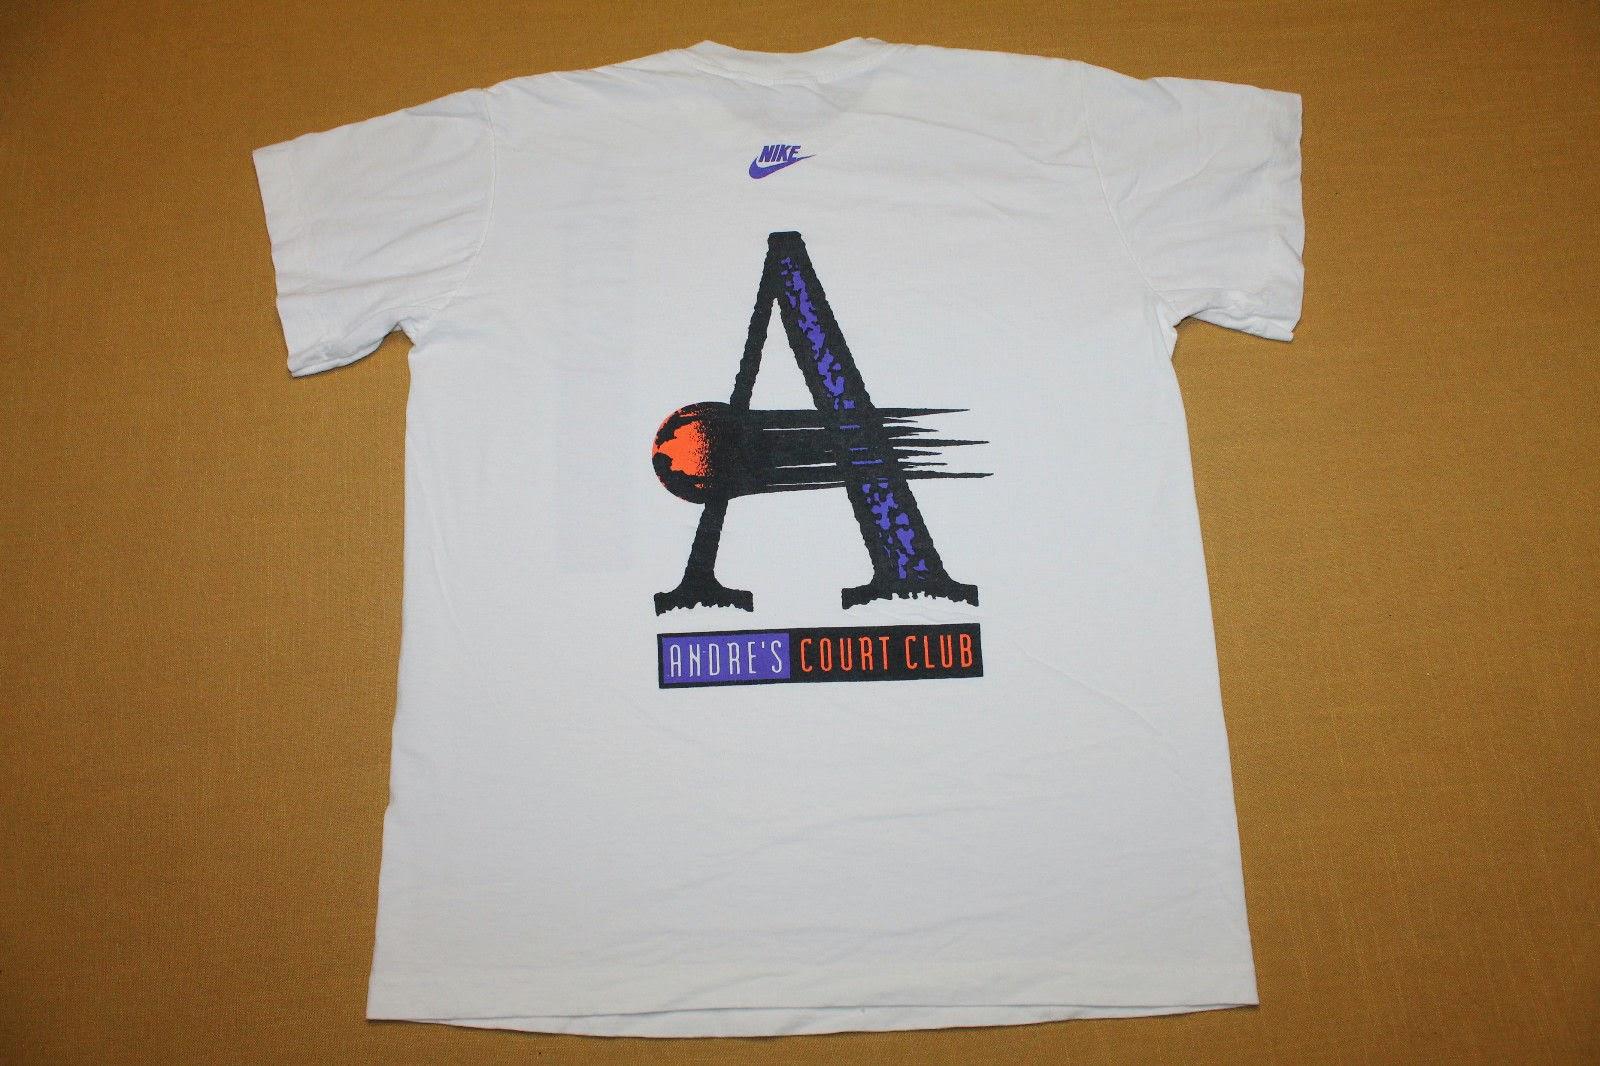 de6207ff 90s NIKE andre agassi challenge court t shirt   vintage t-shirt